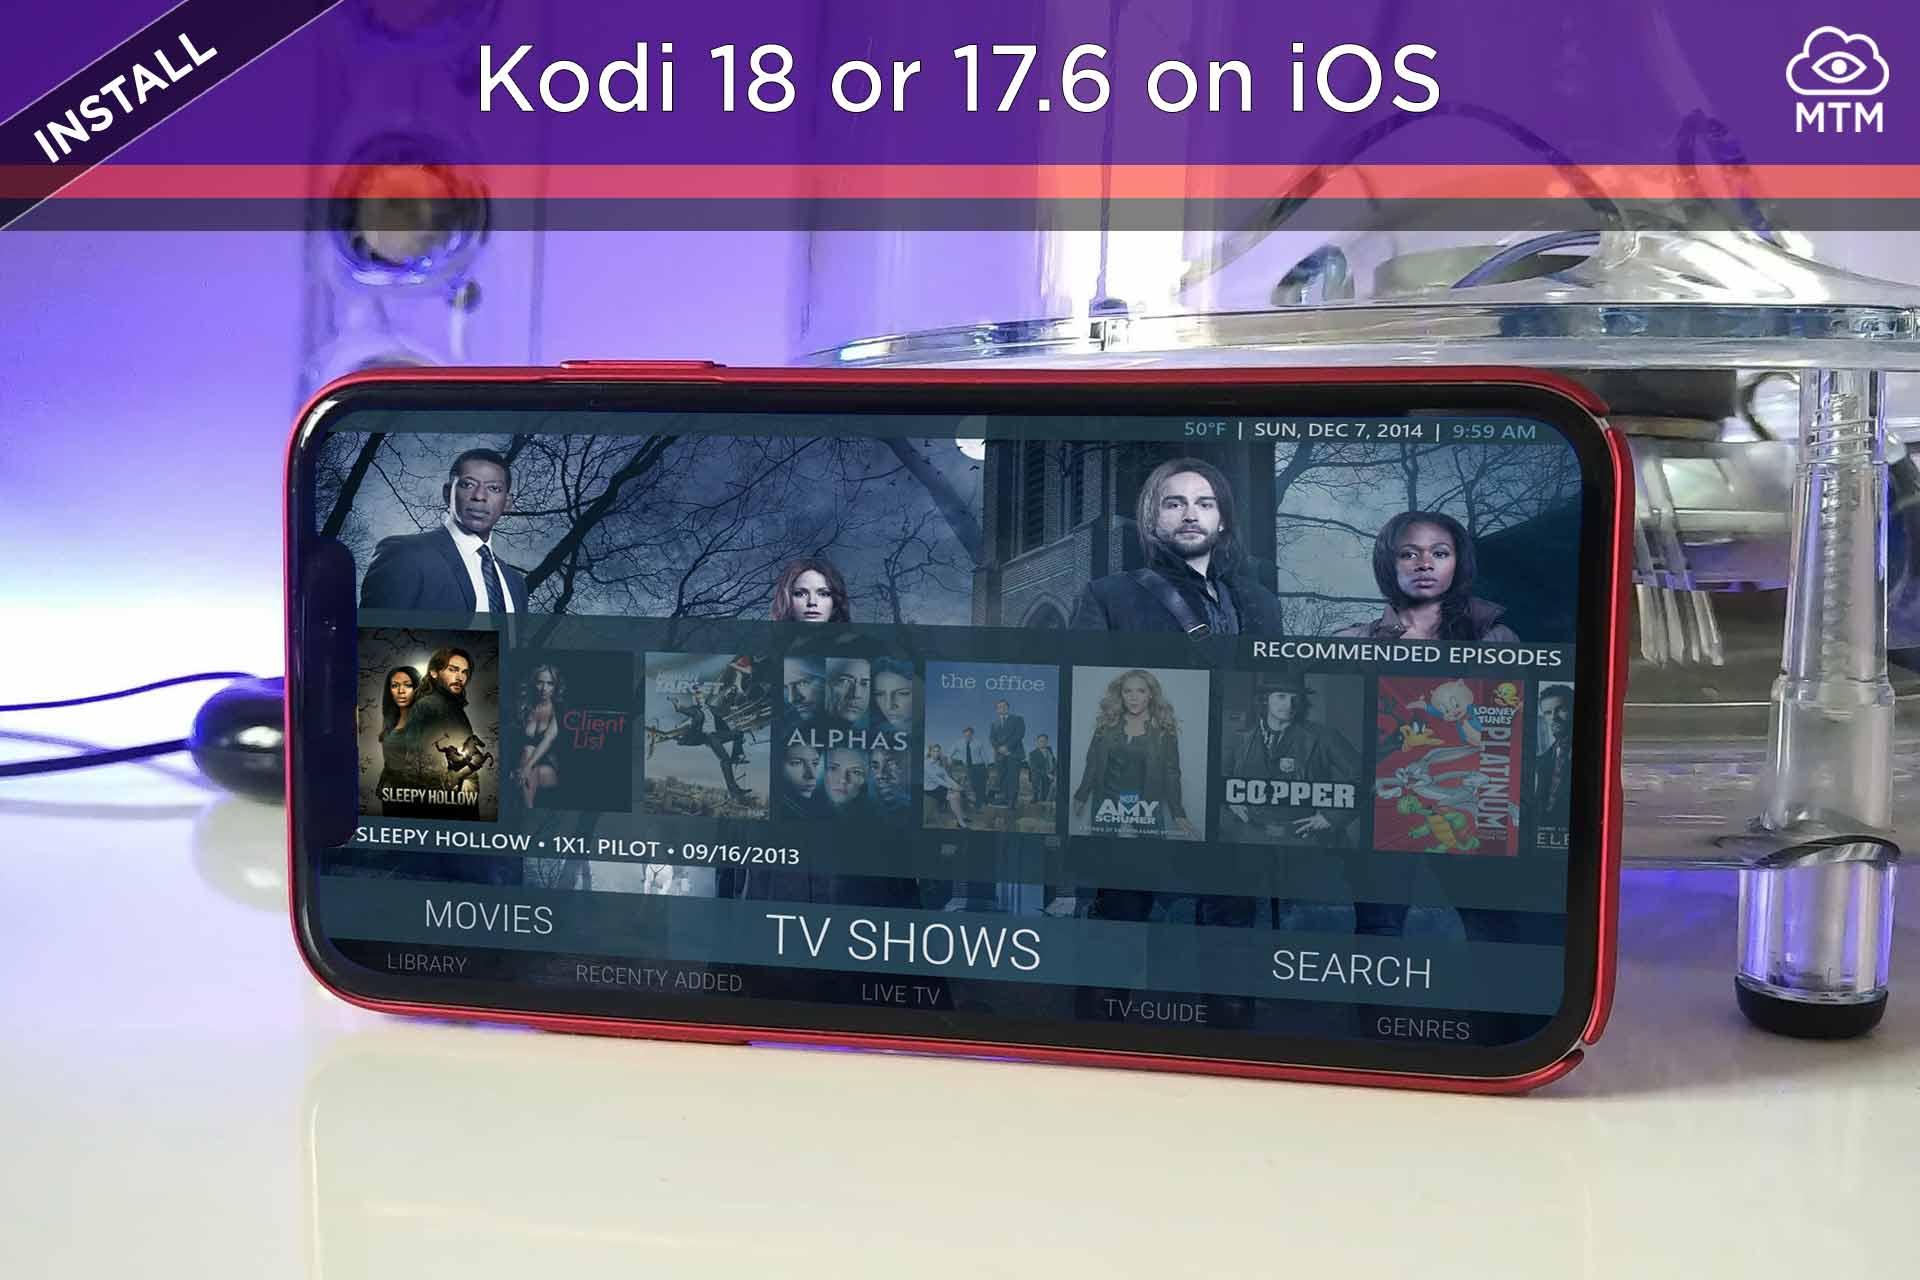 Download Kodi 18 on iPhone, iPad, or iPod [No Jailbreak Install 2019]